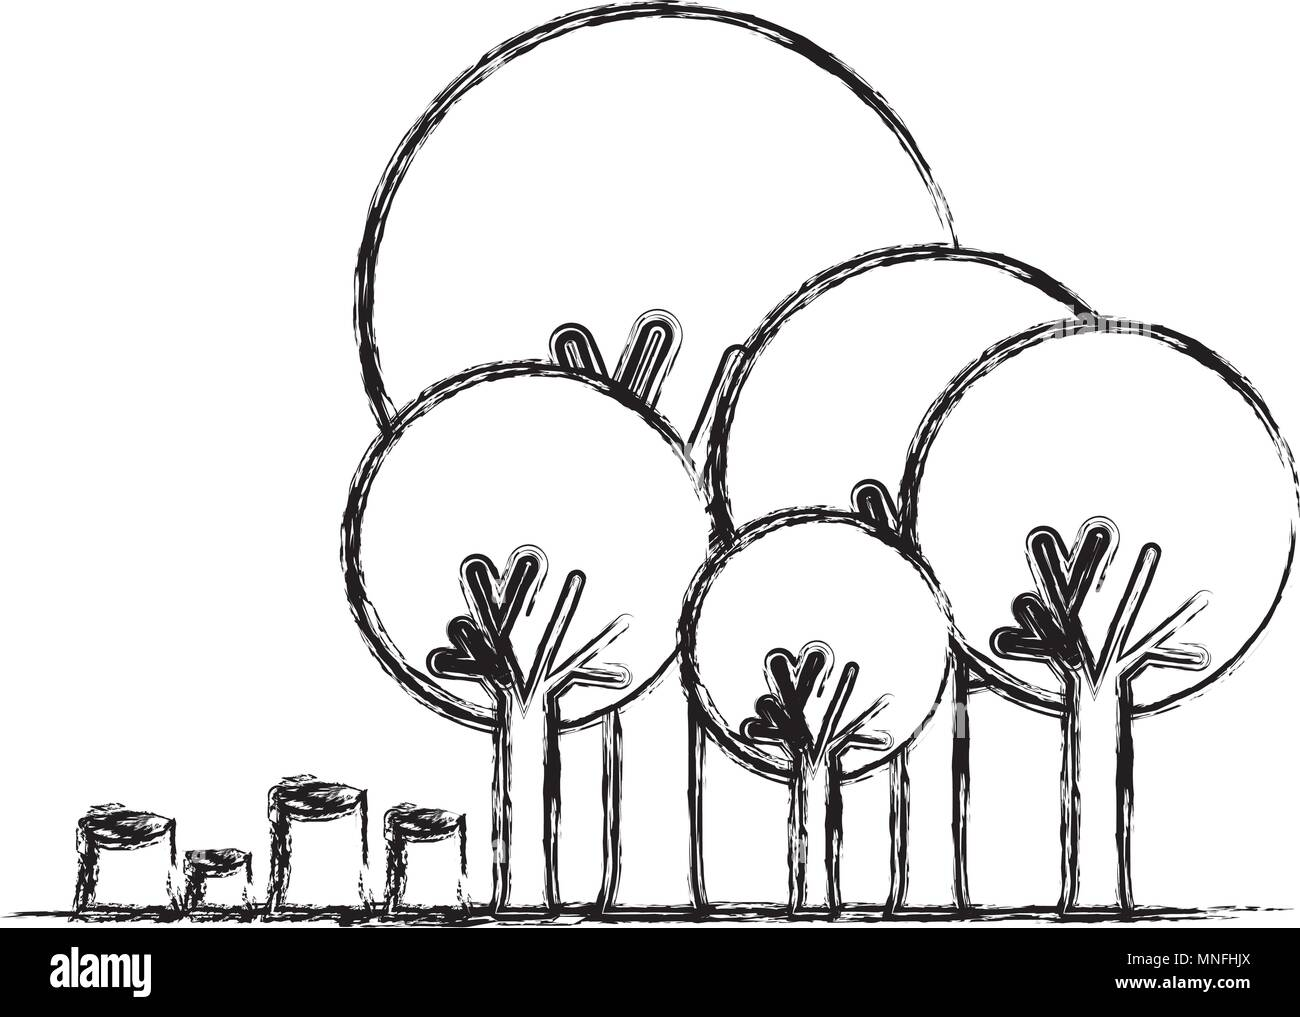 deforestation stock vector images alamy